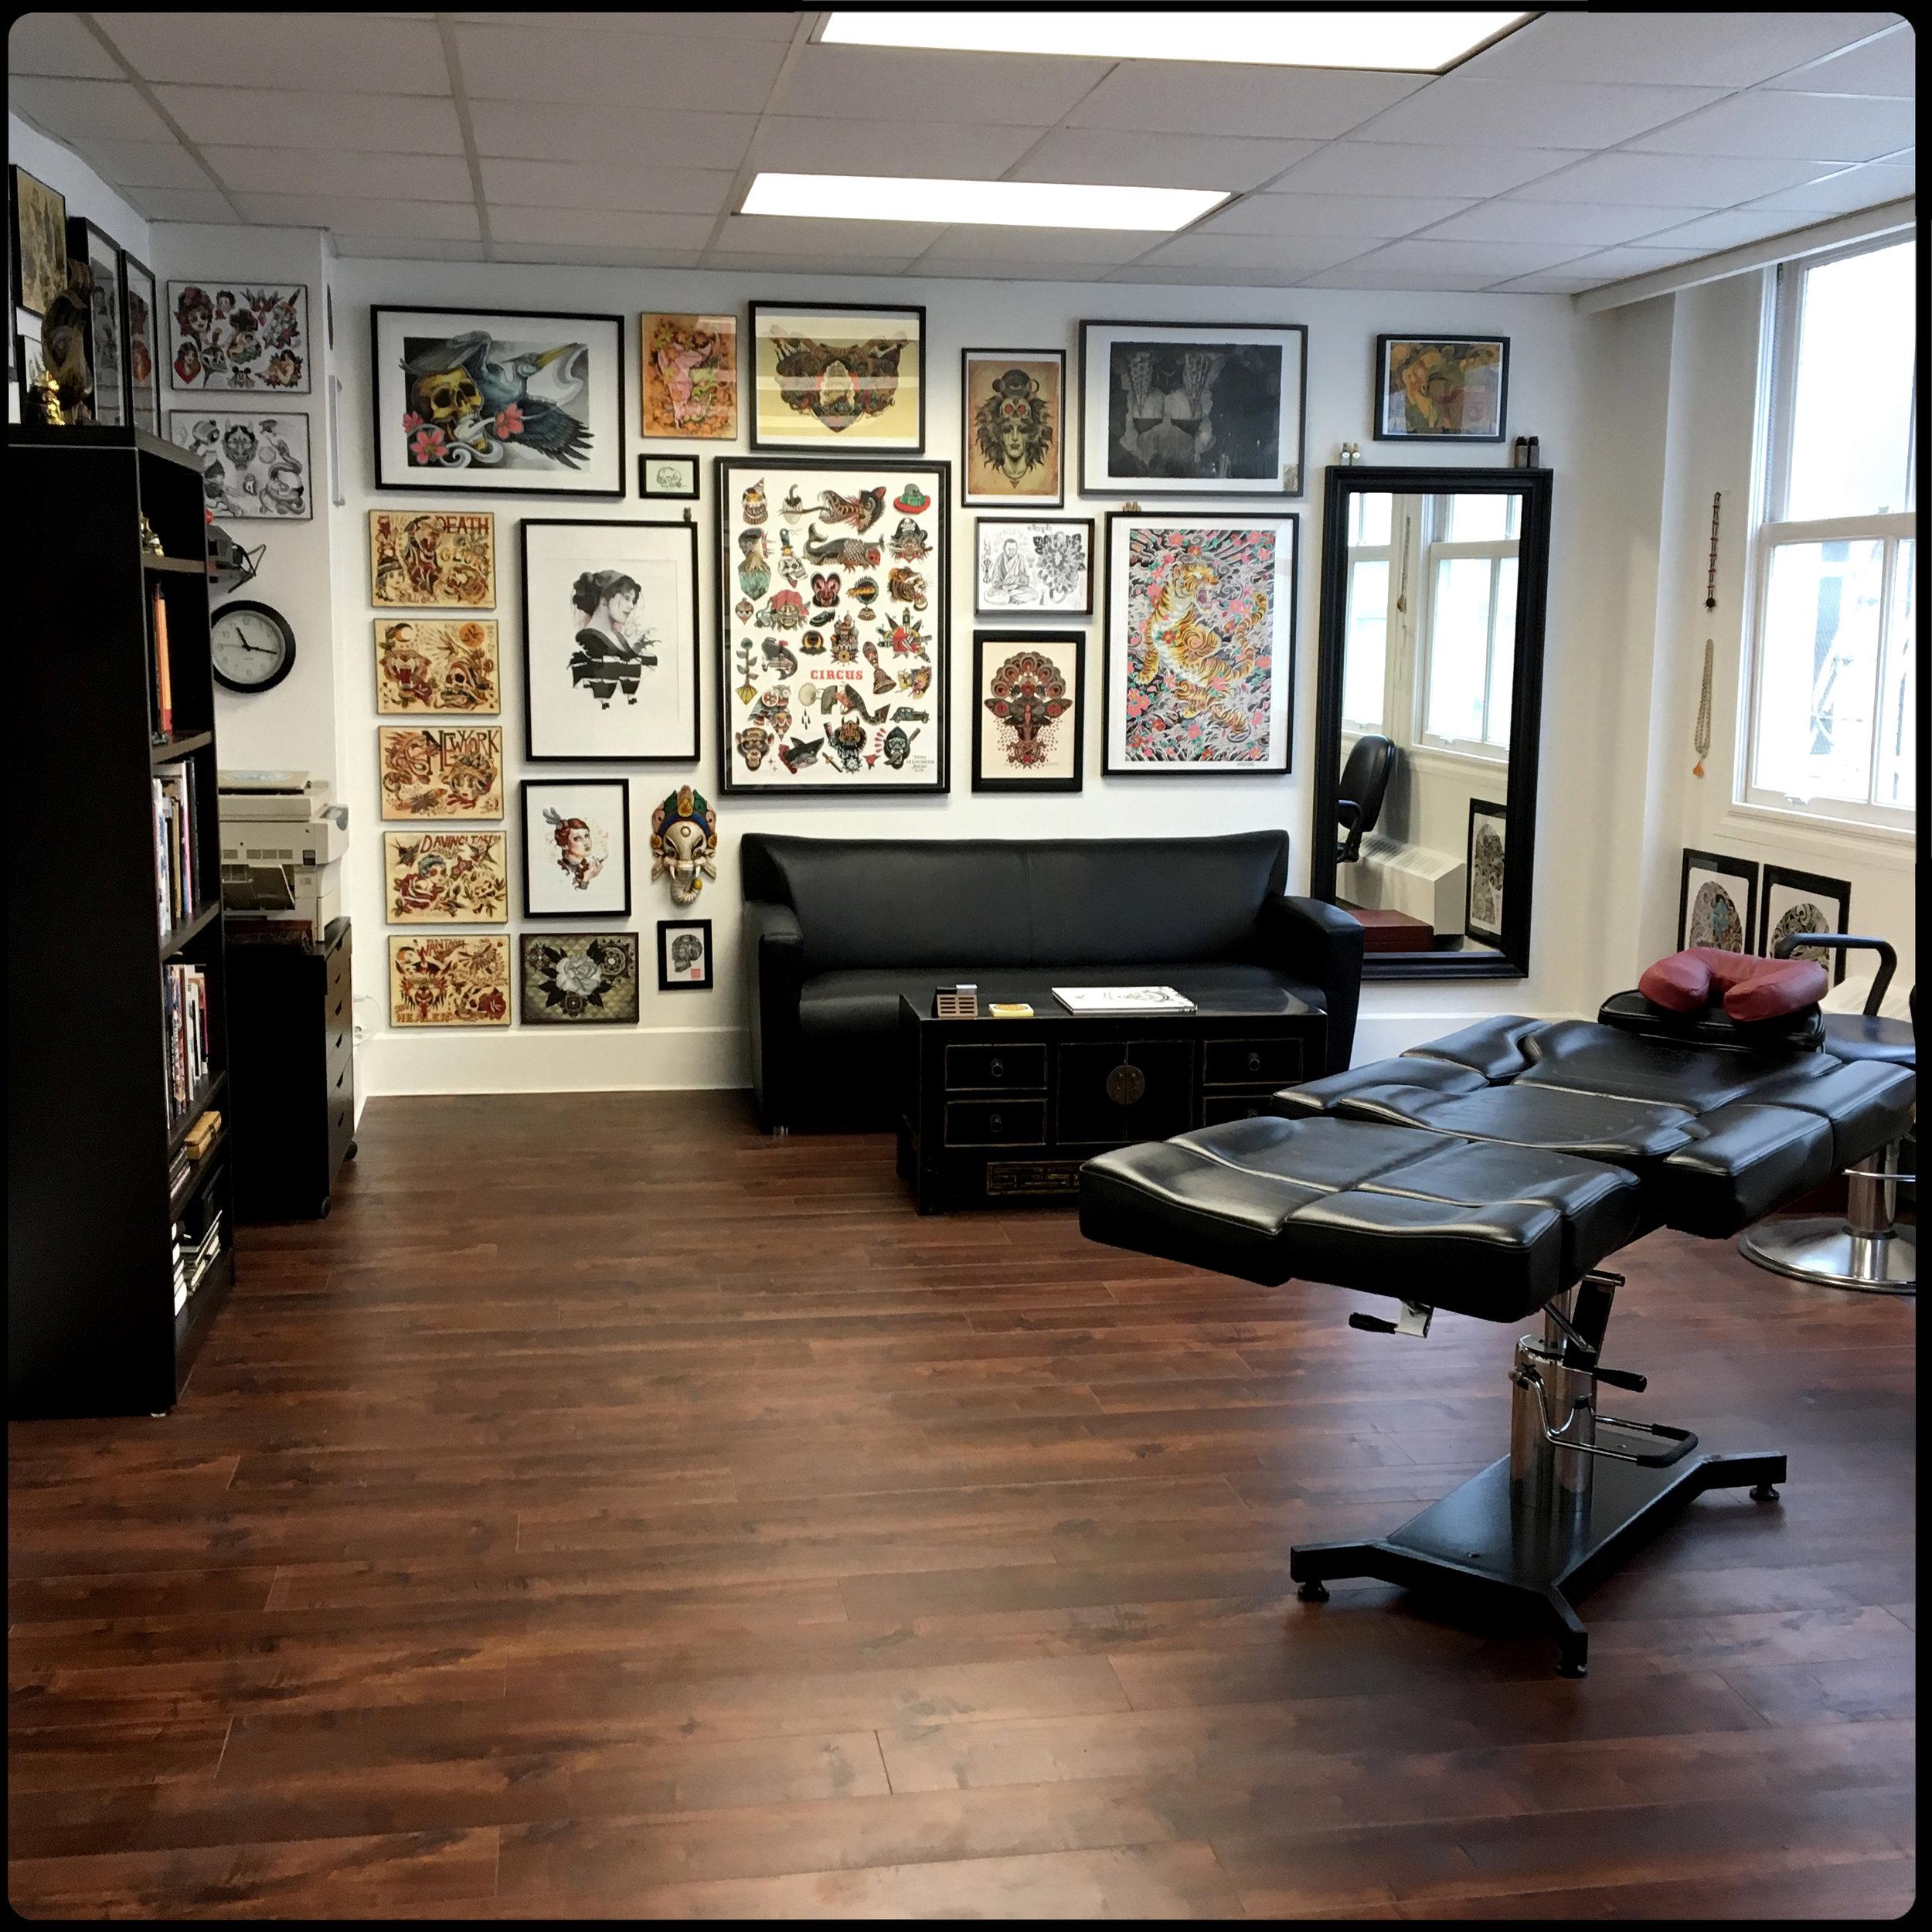 Victoria, BC Tattoo Studio - Paradigm Tattoo Company - Tattoo Artist - Cohen Floch - Vancouver Island - Tattoo Shop - Japanese - Mandala - Traditional - Tattoos